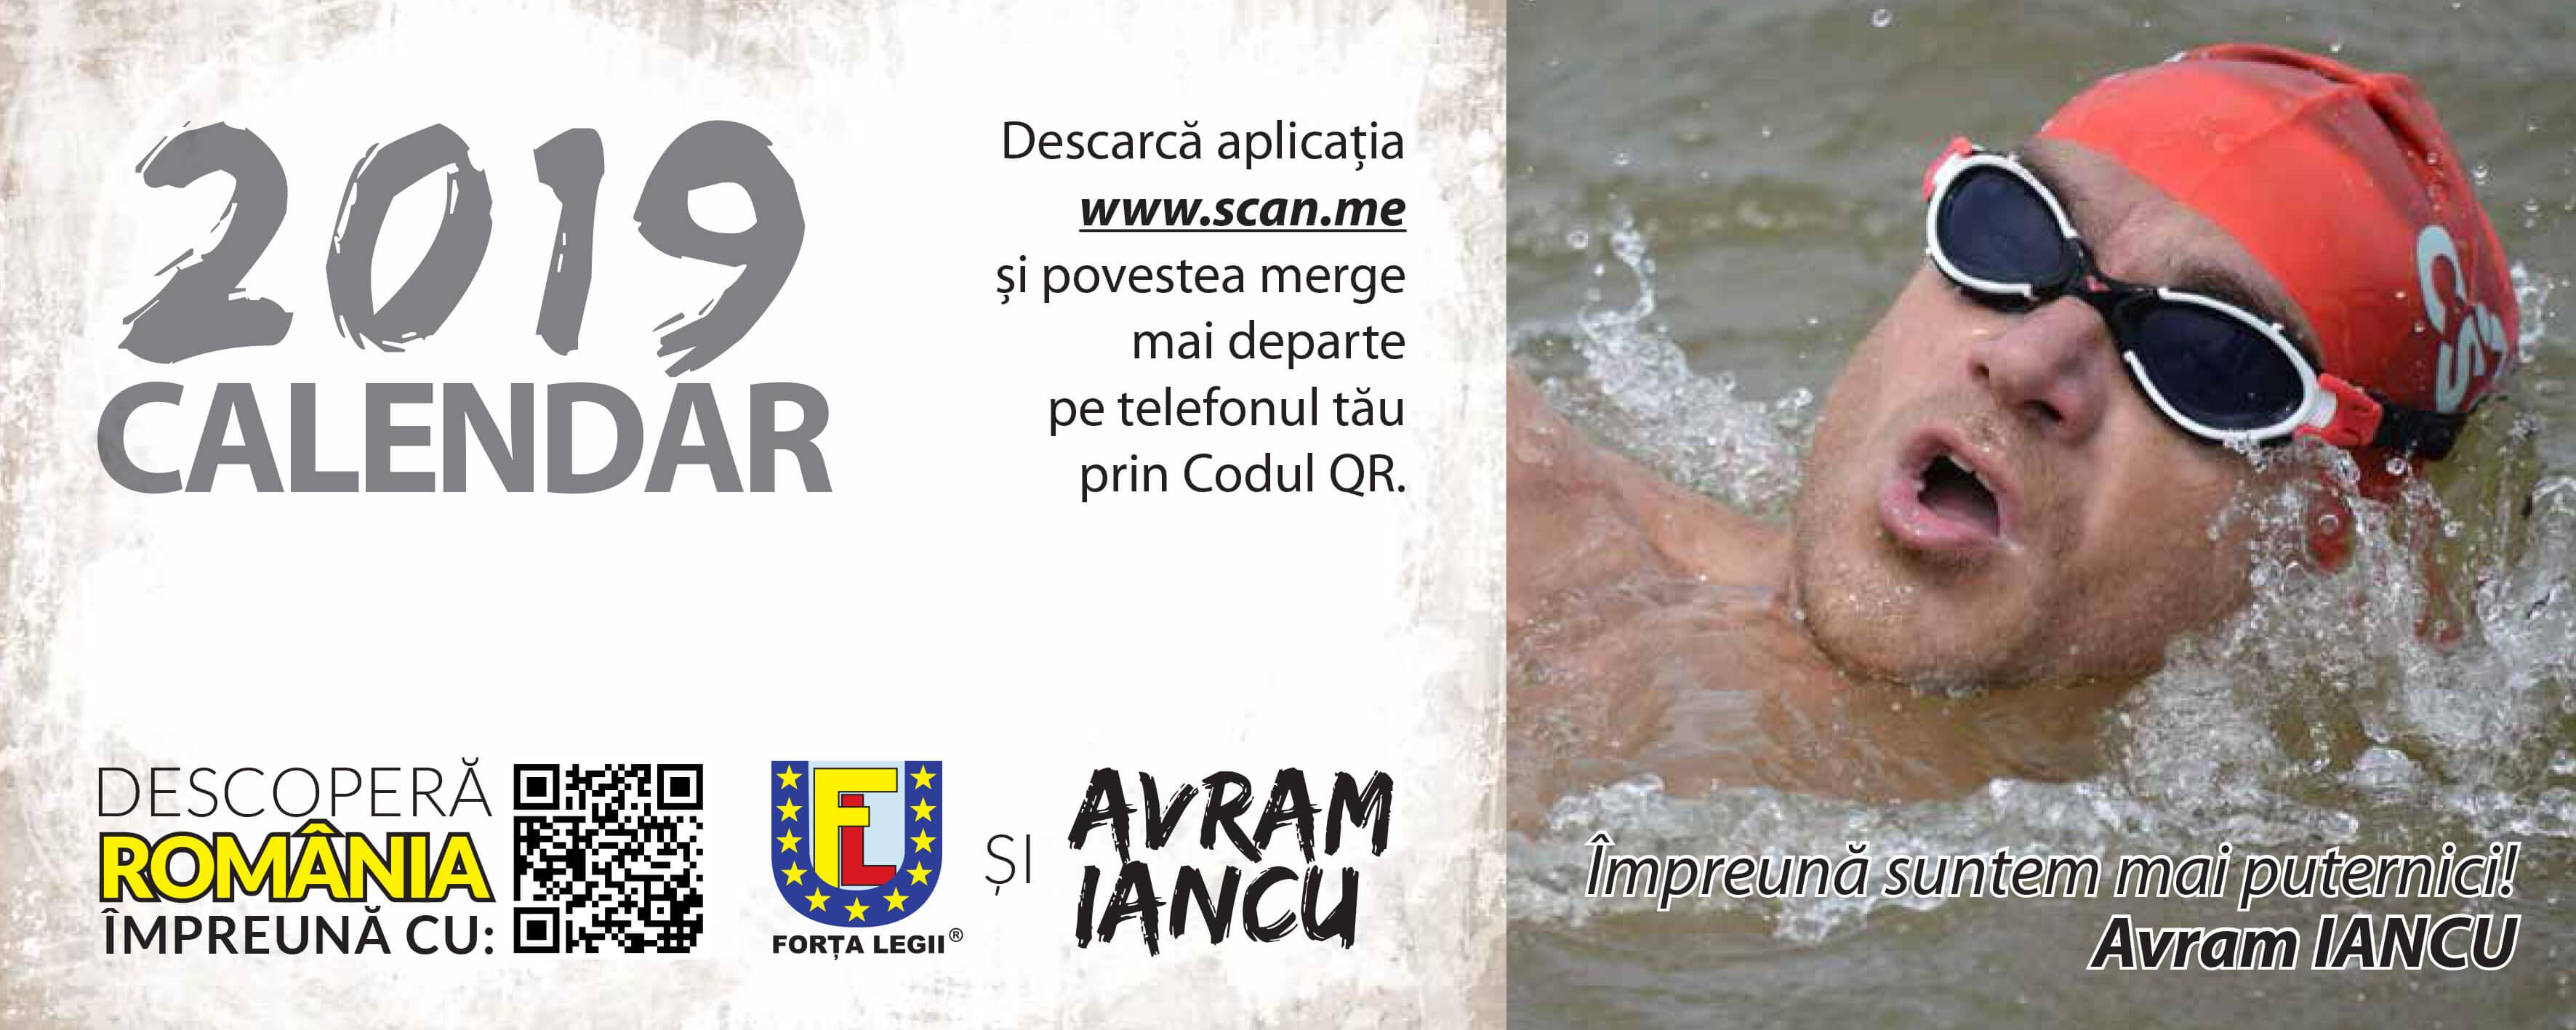 Calendar Avram IANCU 2019